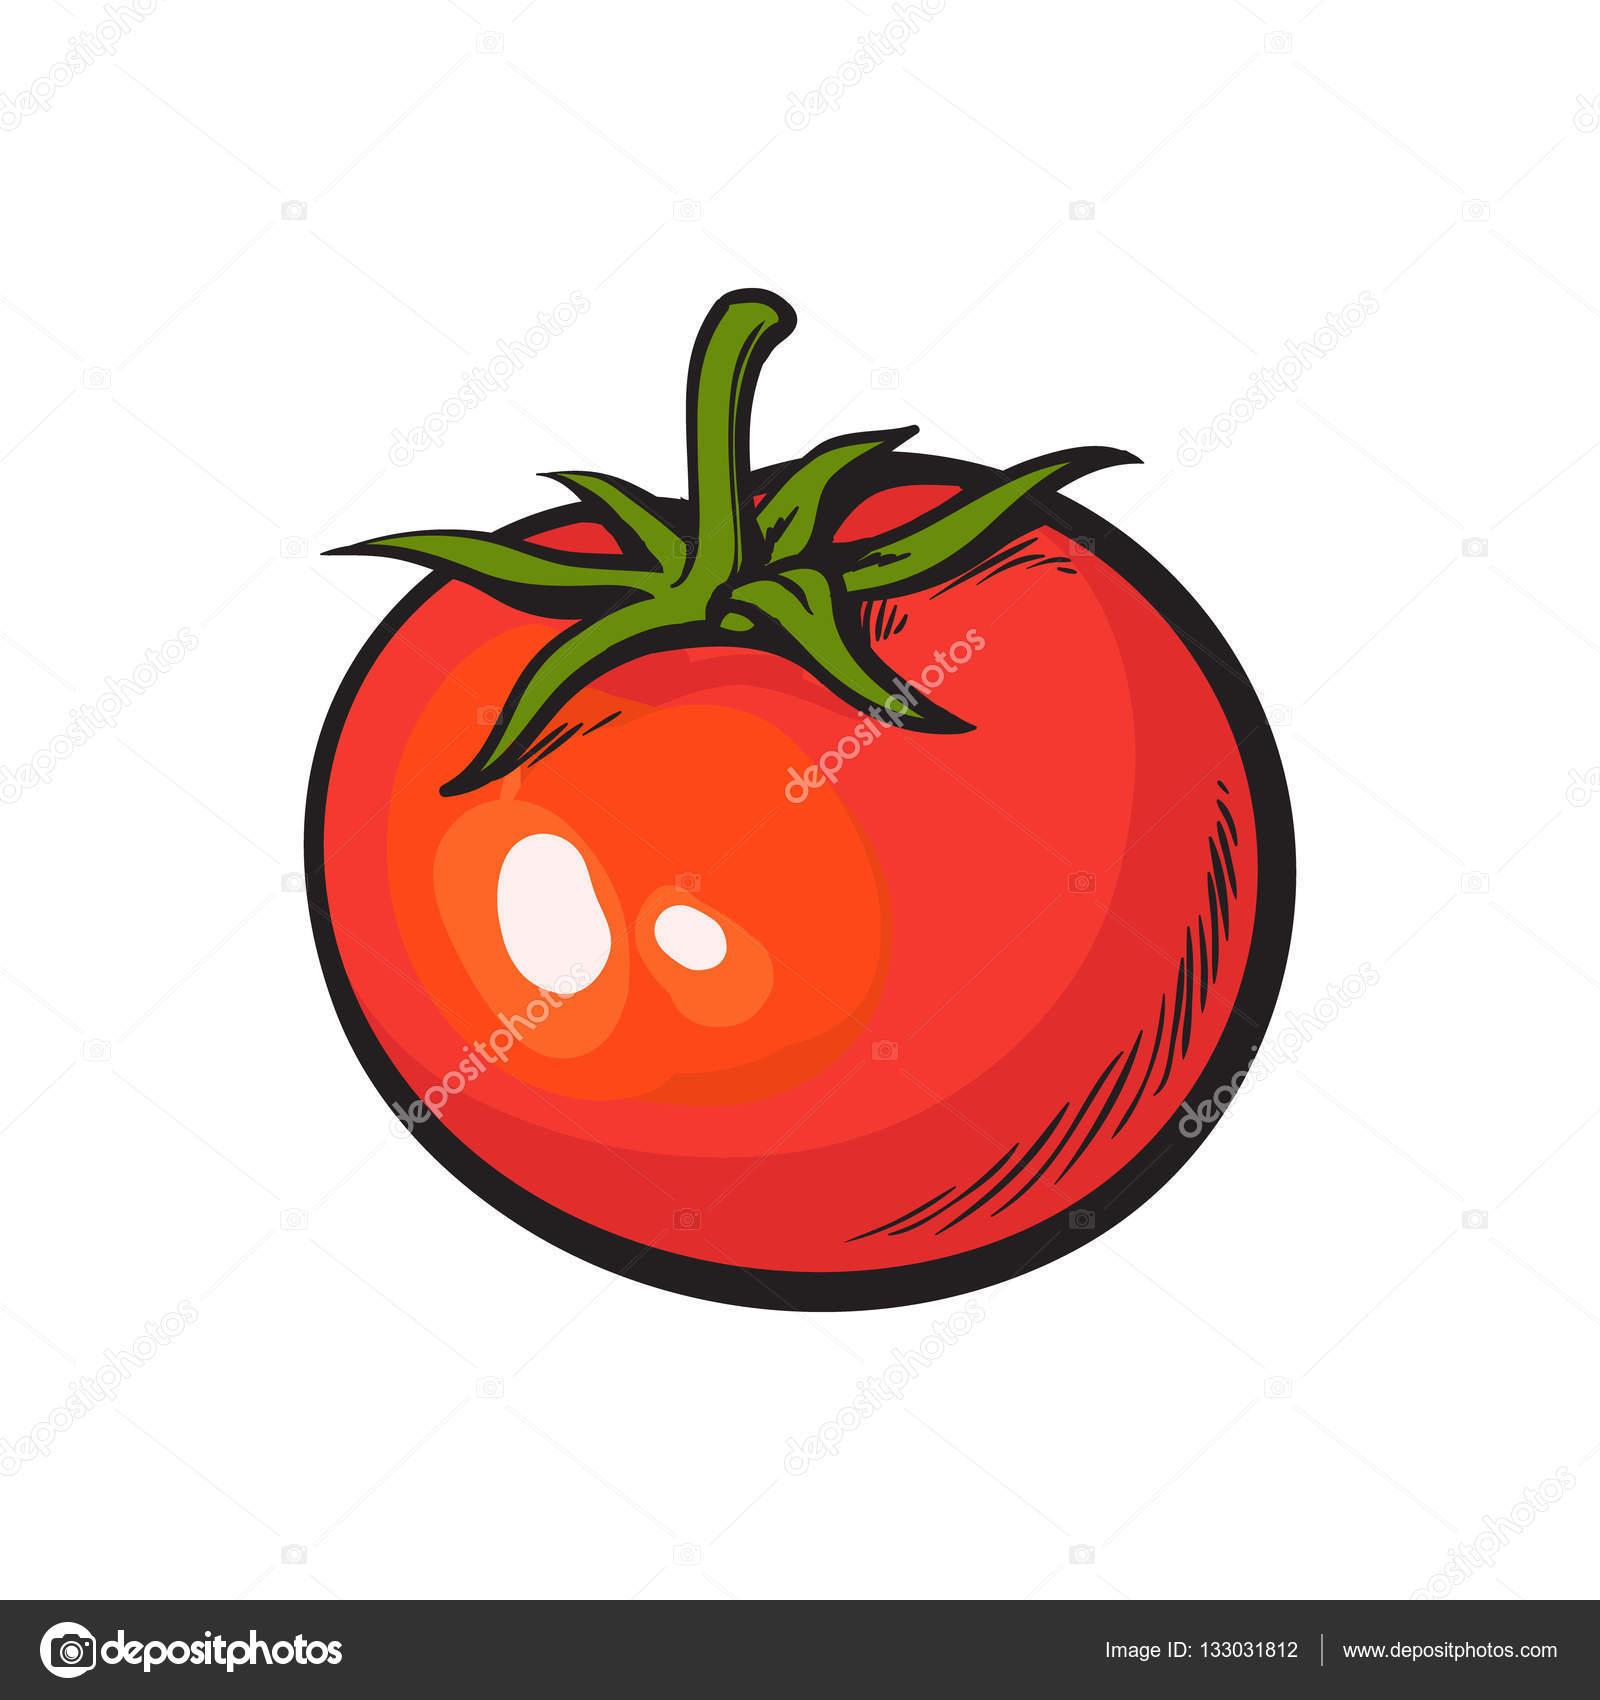 Estilo de dibujo dibujo de brillante tomate rojo maduro archivo im genes vectoriales - Dessin de tomate ...